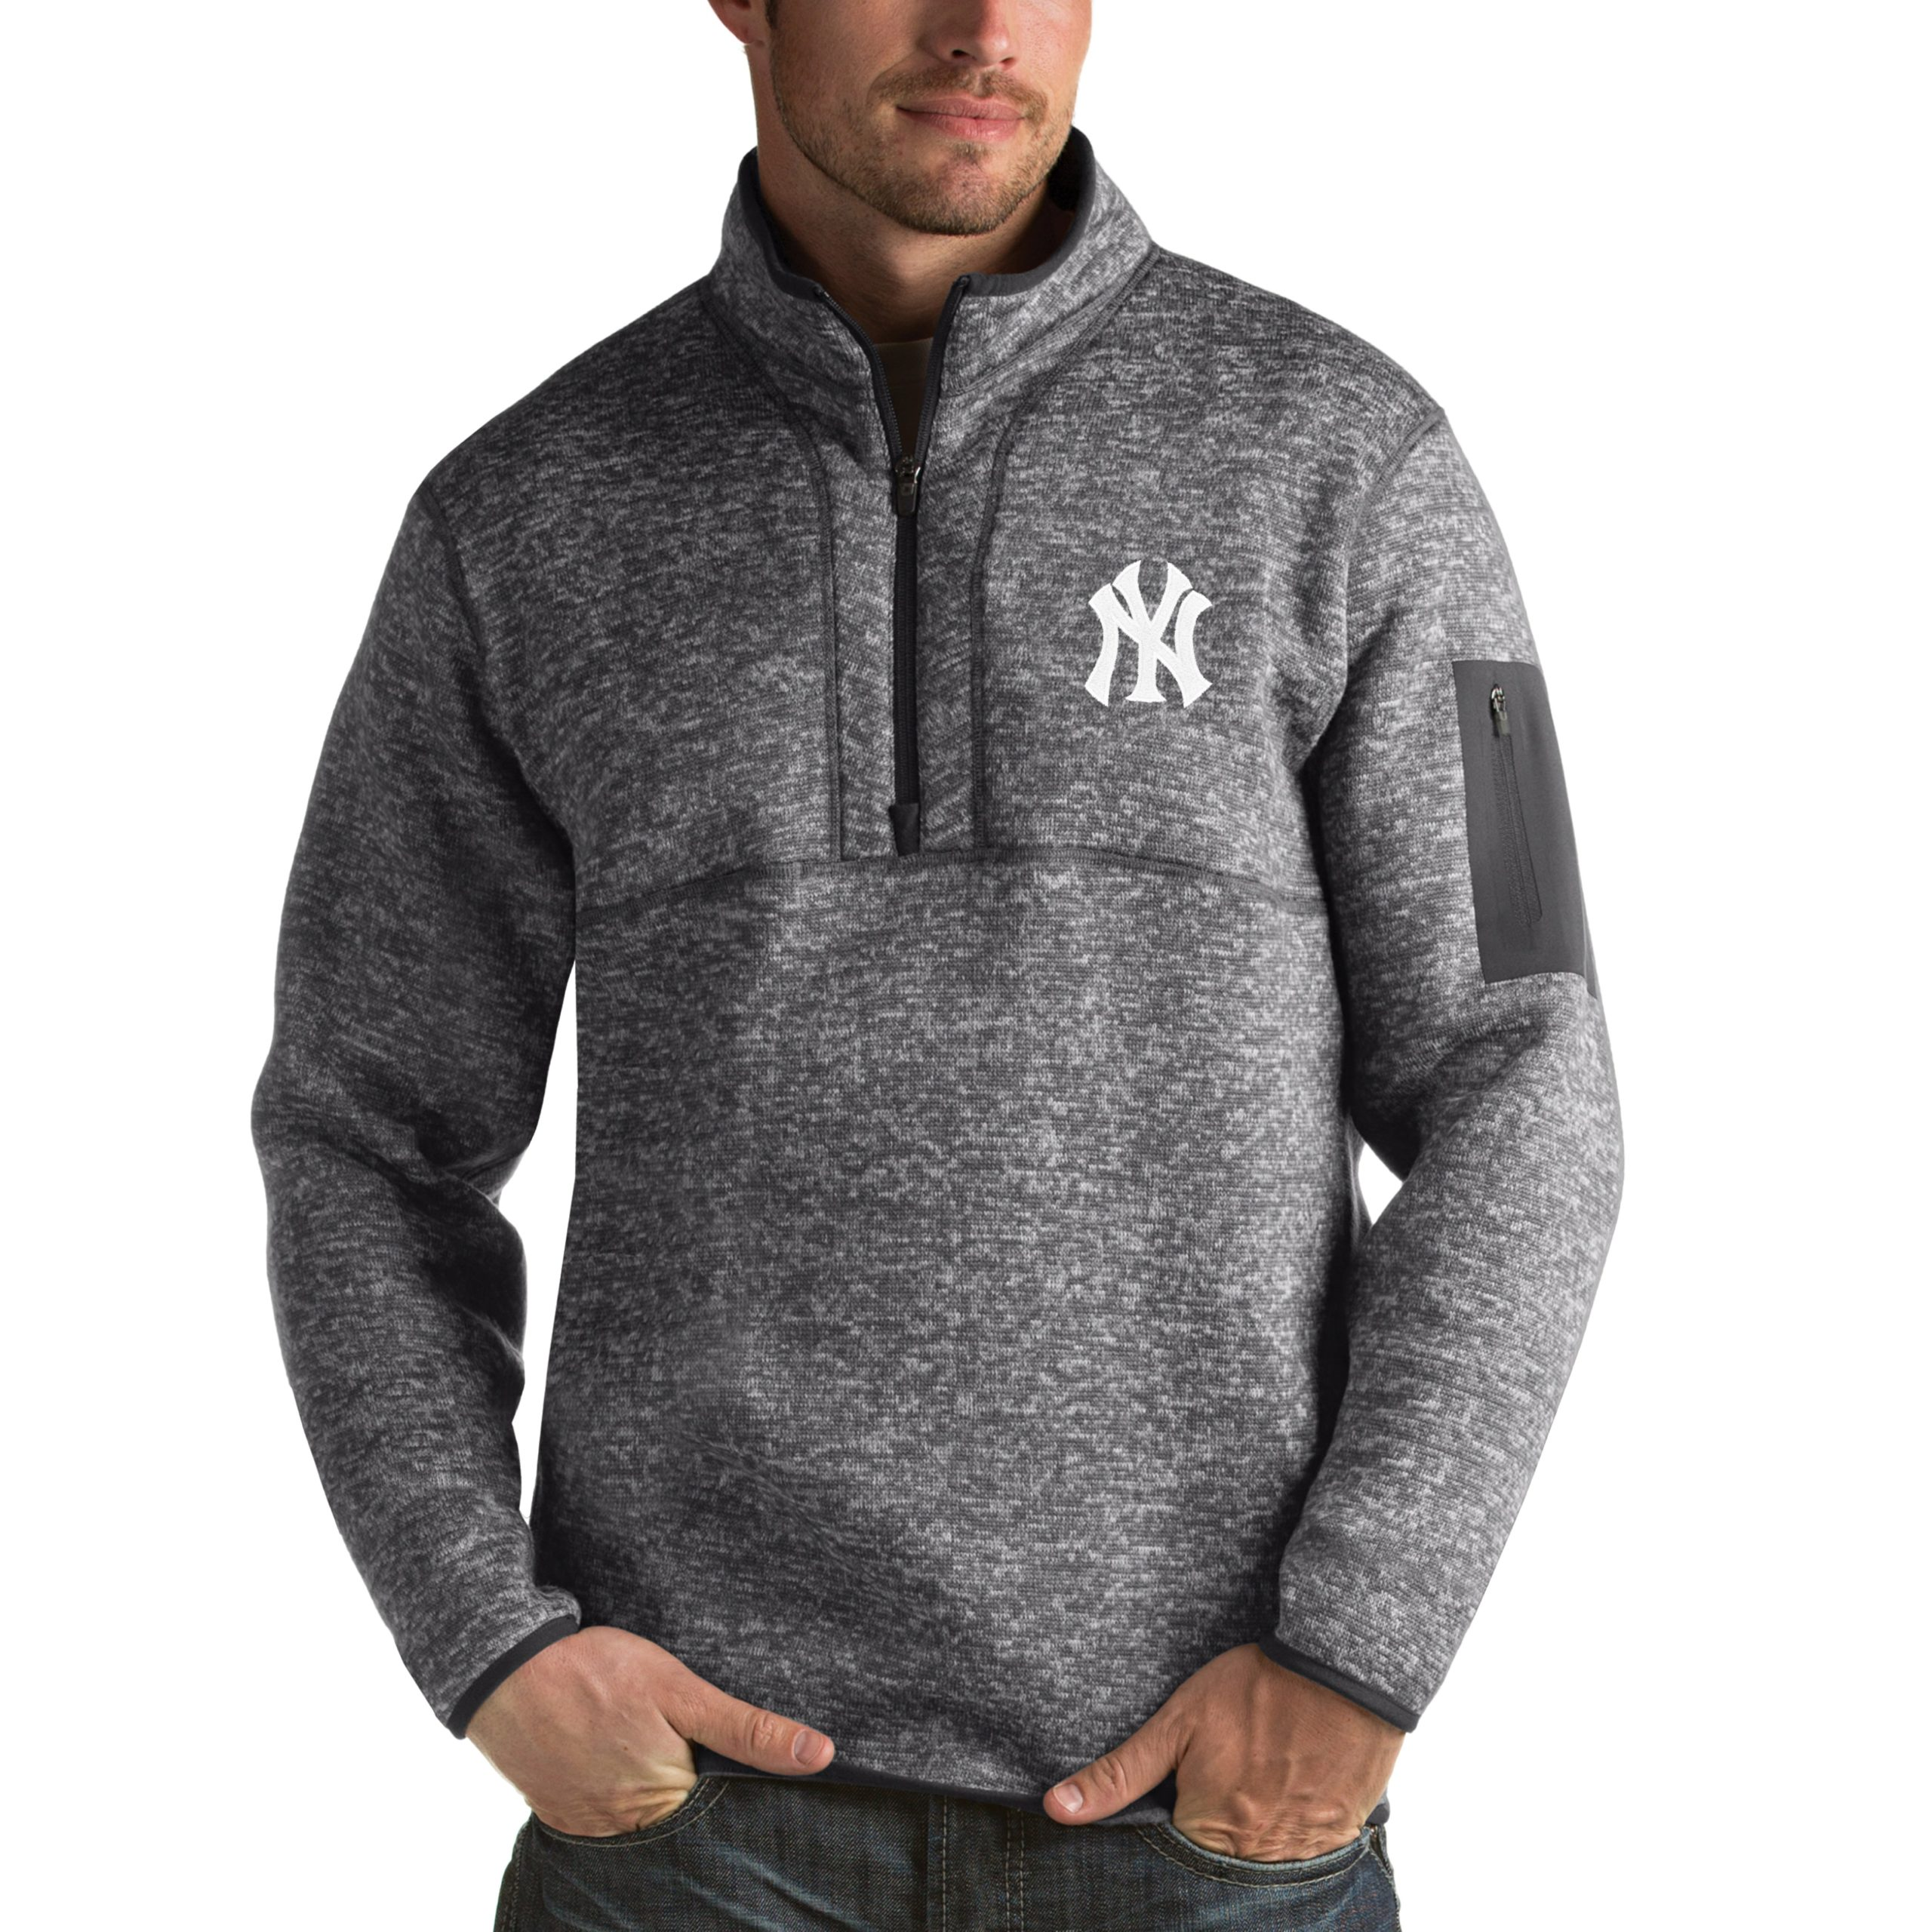 New York Yankees Antigua Fortune Half-Zip Sweater - Heathered Charcoal